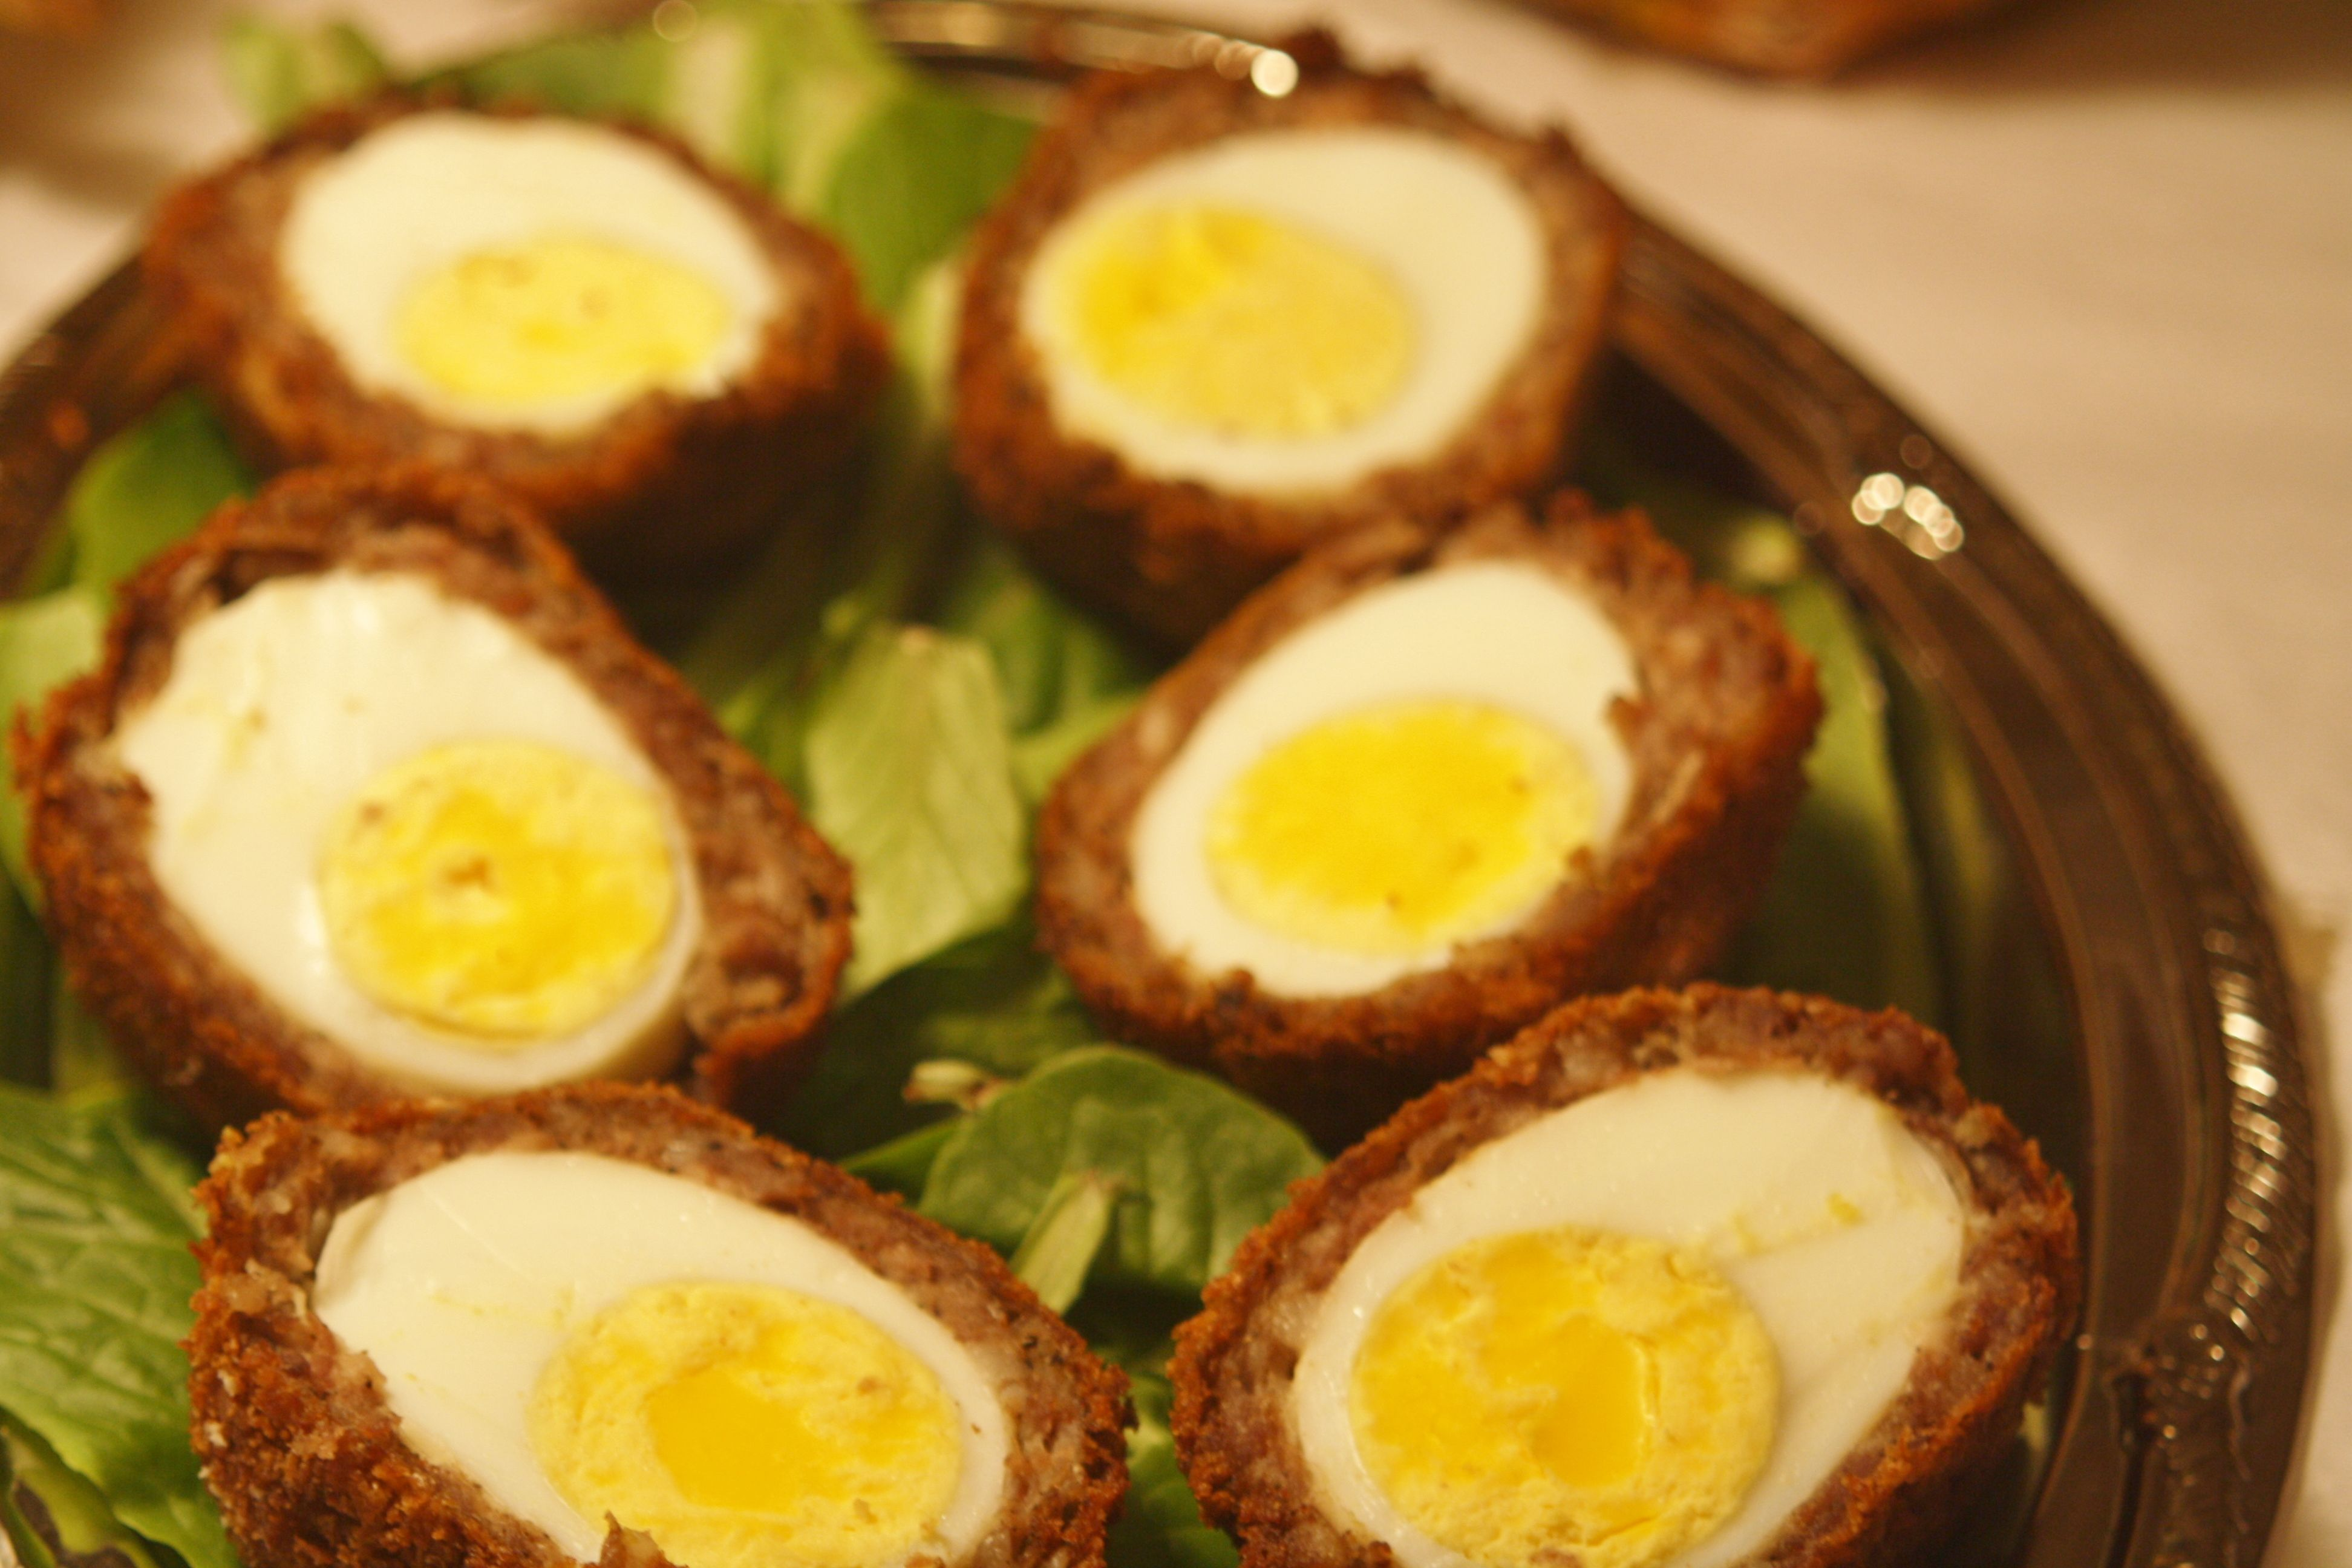 f1a27dd8a0ce7325ecdff911c44295b6 - Scotch Eggs Better Homes And Gardens